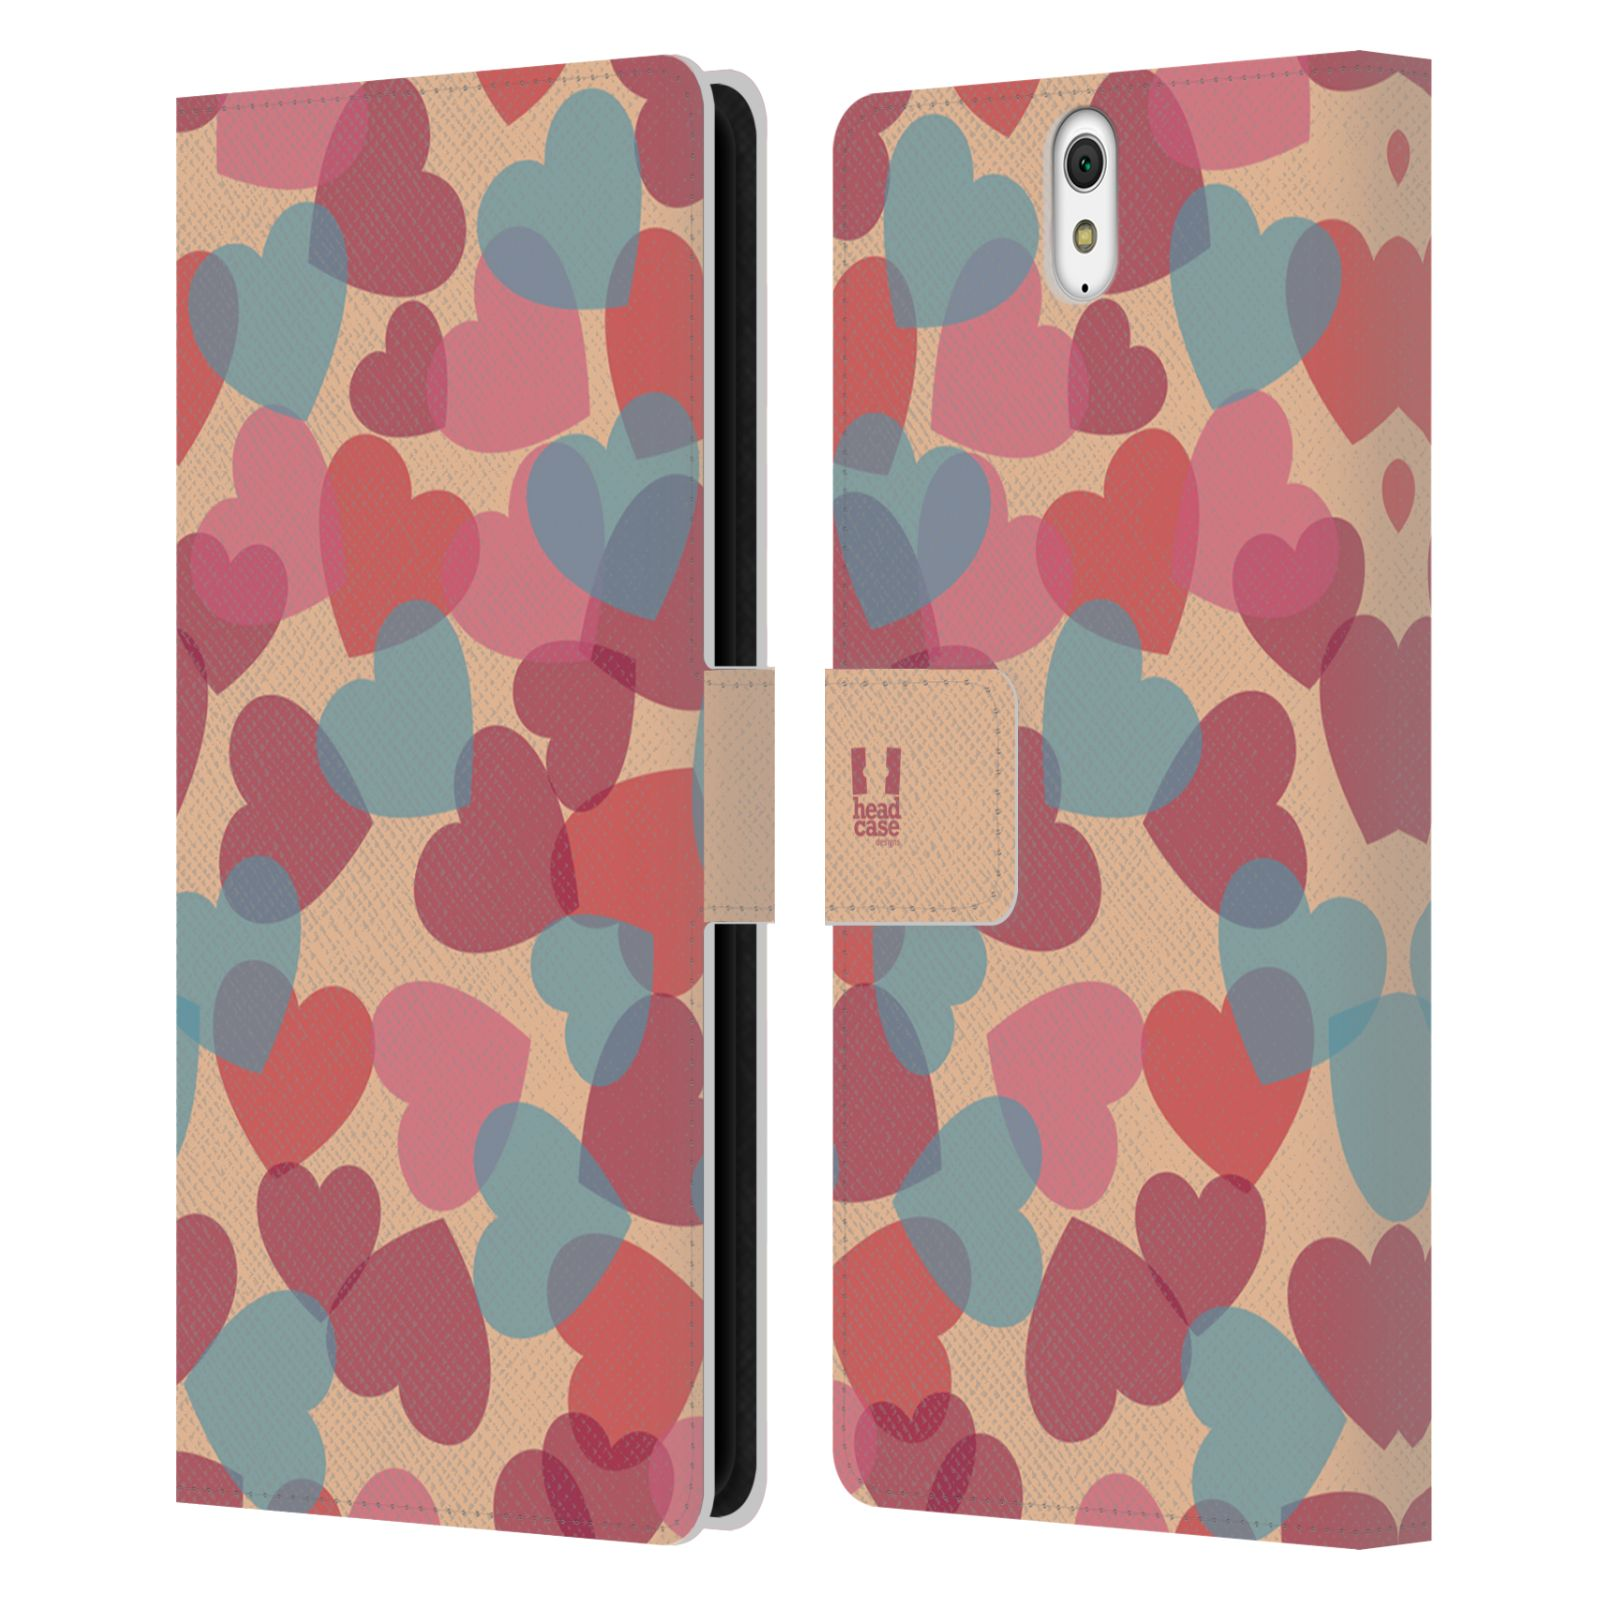 HEAD CASE Flipové pouzdro pro mobil SONY XPERIA C5 Ultra vzor prolínající se srdíčka, srdce, láska, růžová